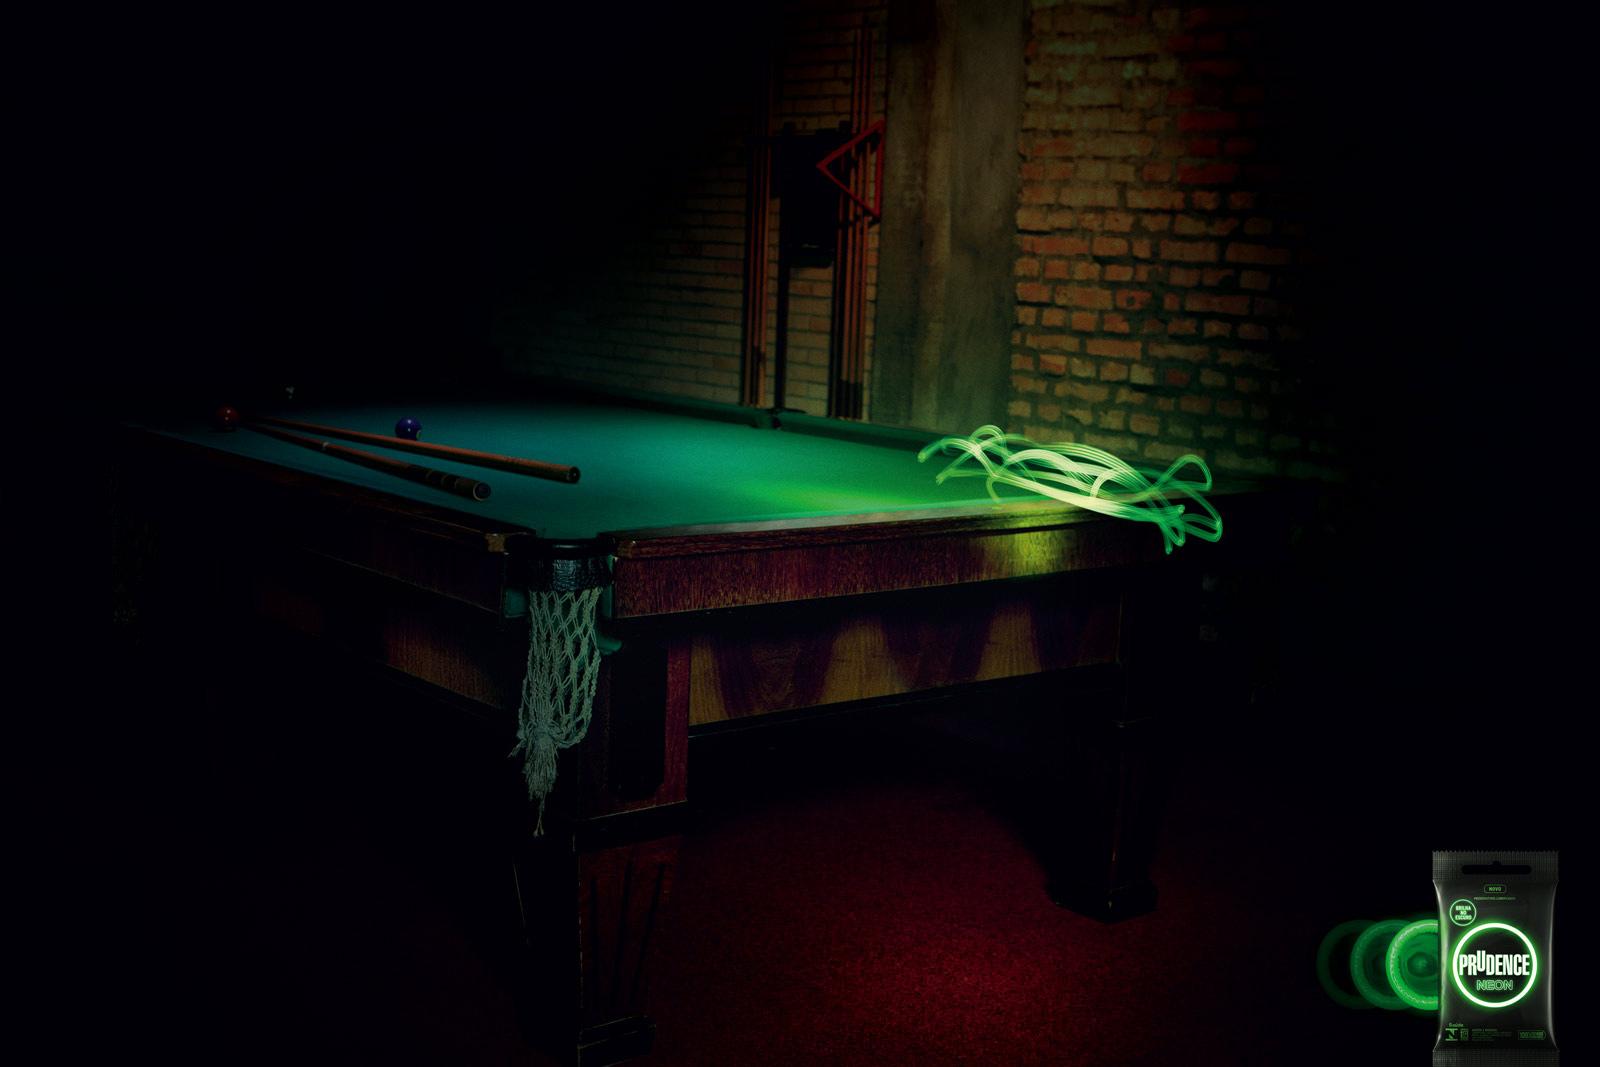 Prudence_Neon_Condoms_Snooker_ibelieveinadv.jpg